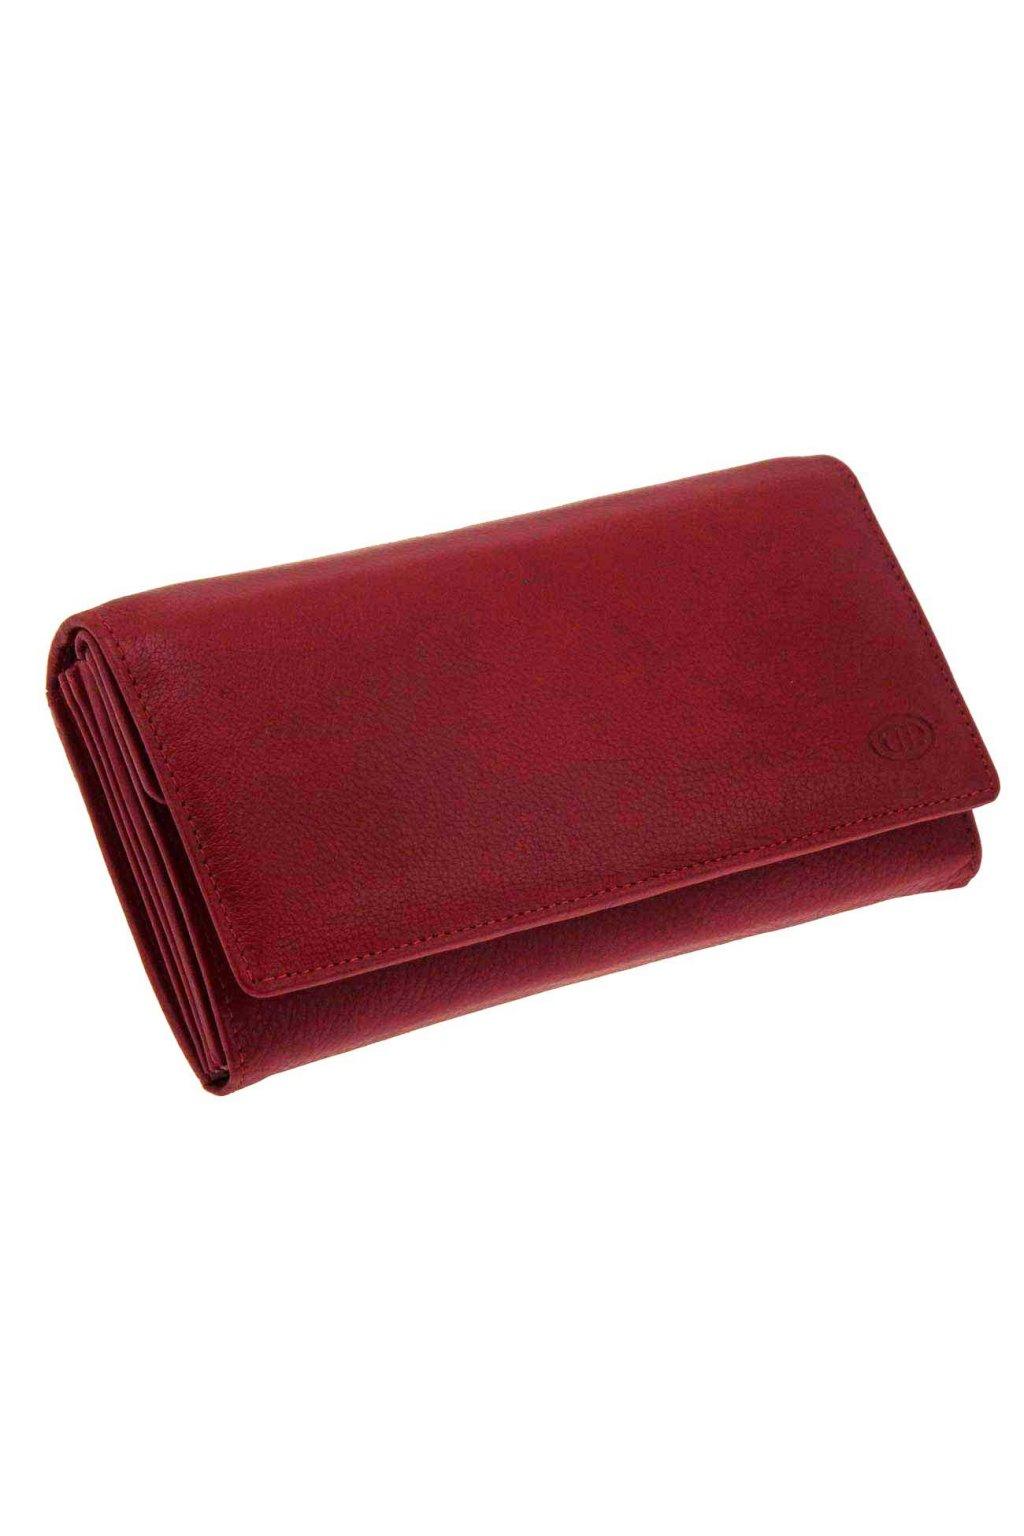 damska kozena penezenka cervena DKP18 S1174 07